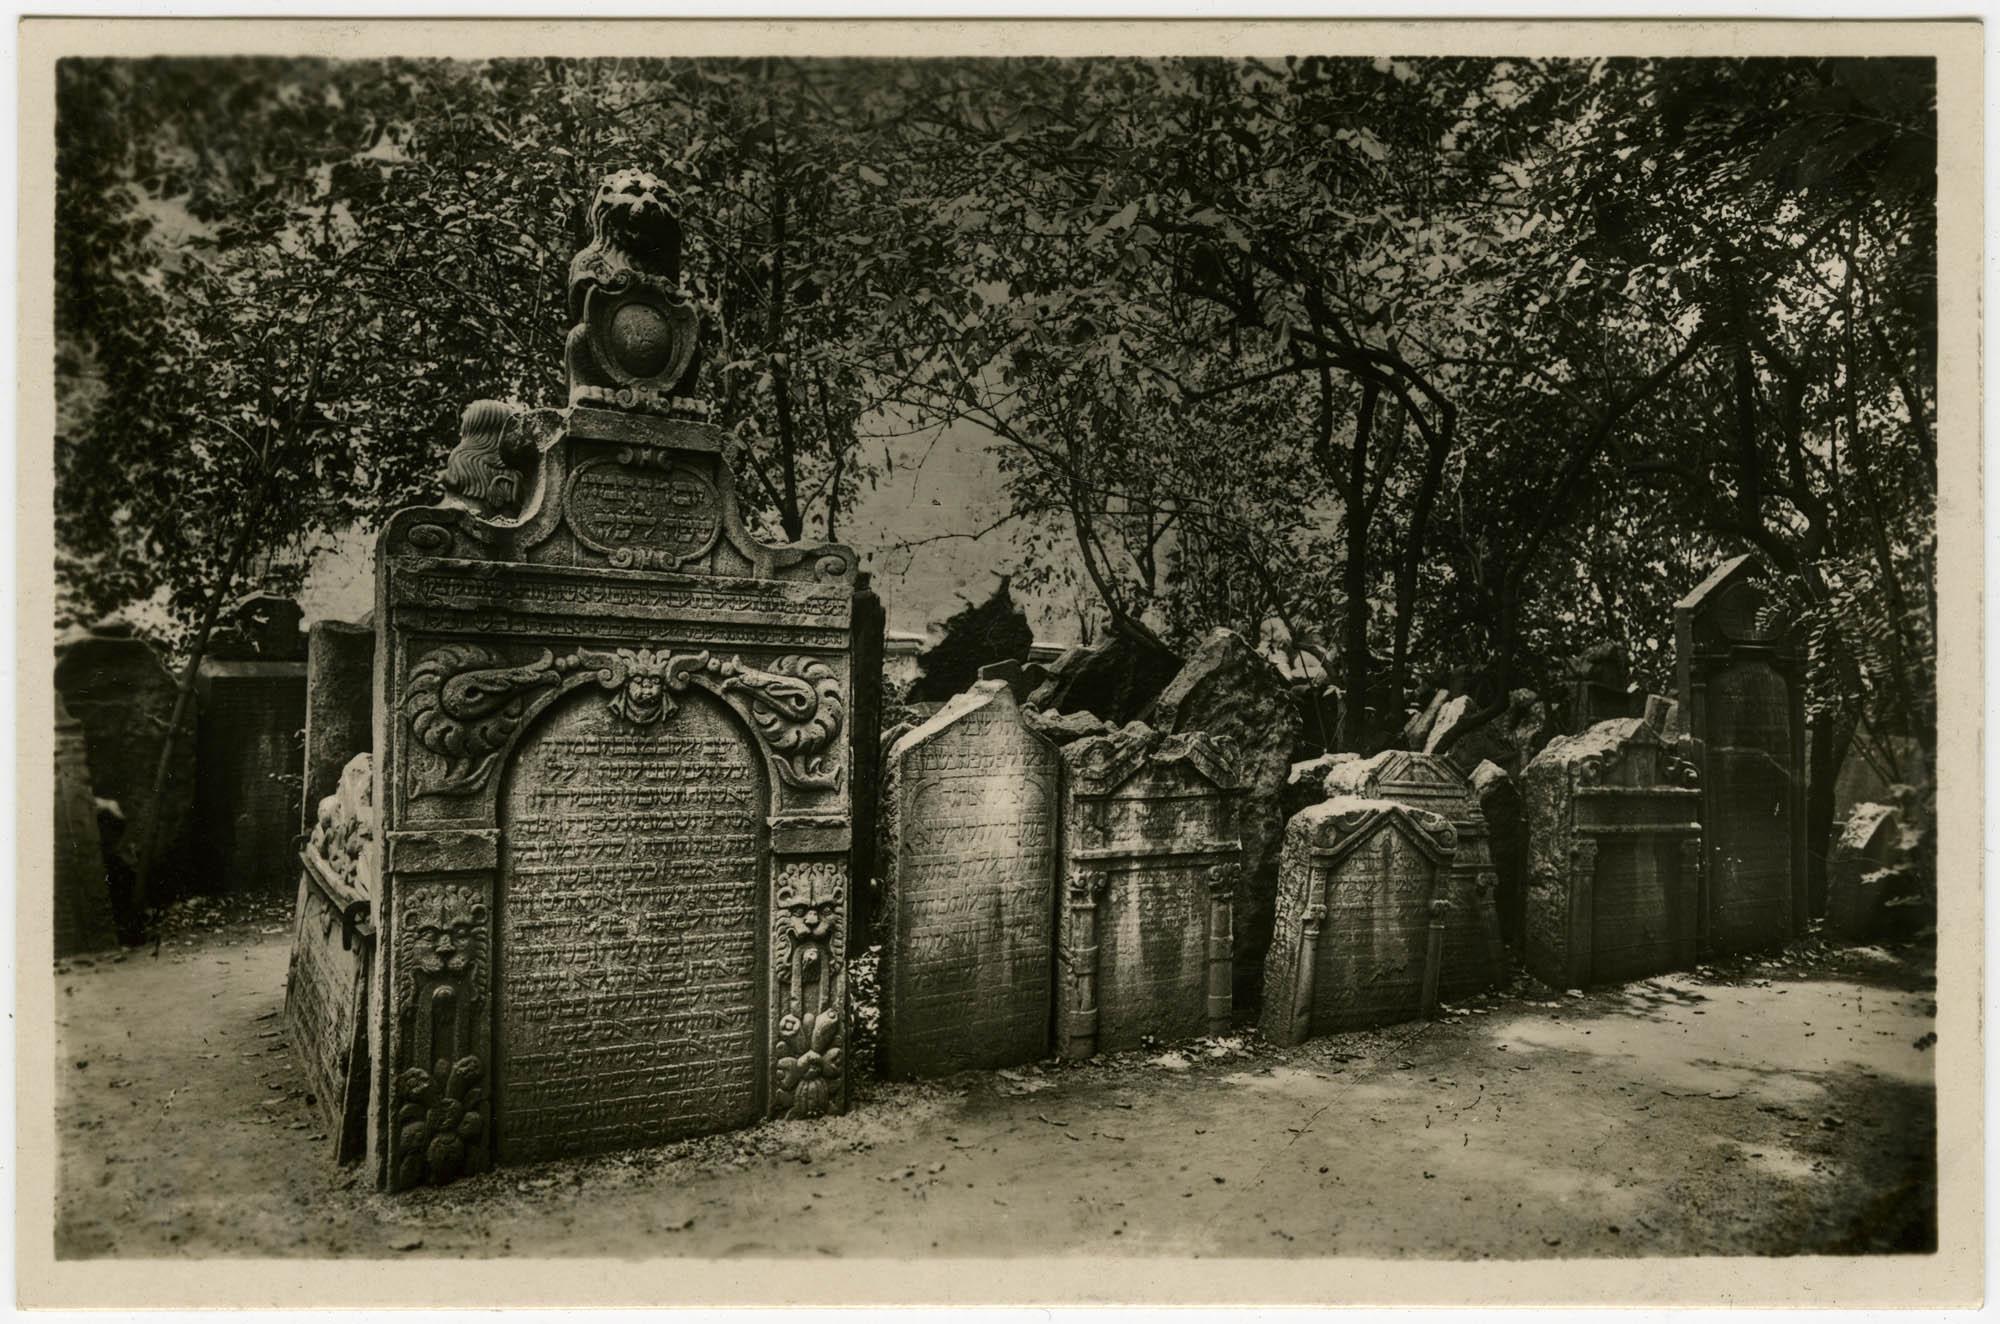 בהק' הישן בפראג / Praha. Skupina hrobů na starém židovském hřbitově. / Prague. Le vieux cimetière juif. / Prag. Grabmalgruppen am alten jüdischen Friedhof. / Prague. The ancient Jewish churchyard.